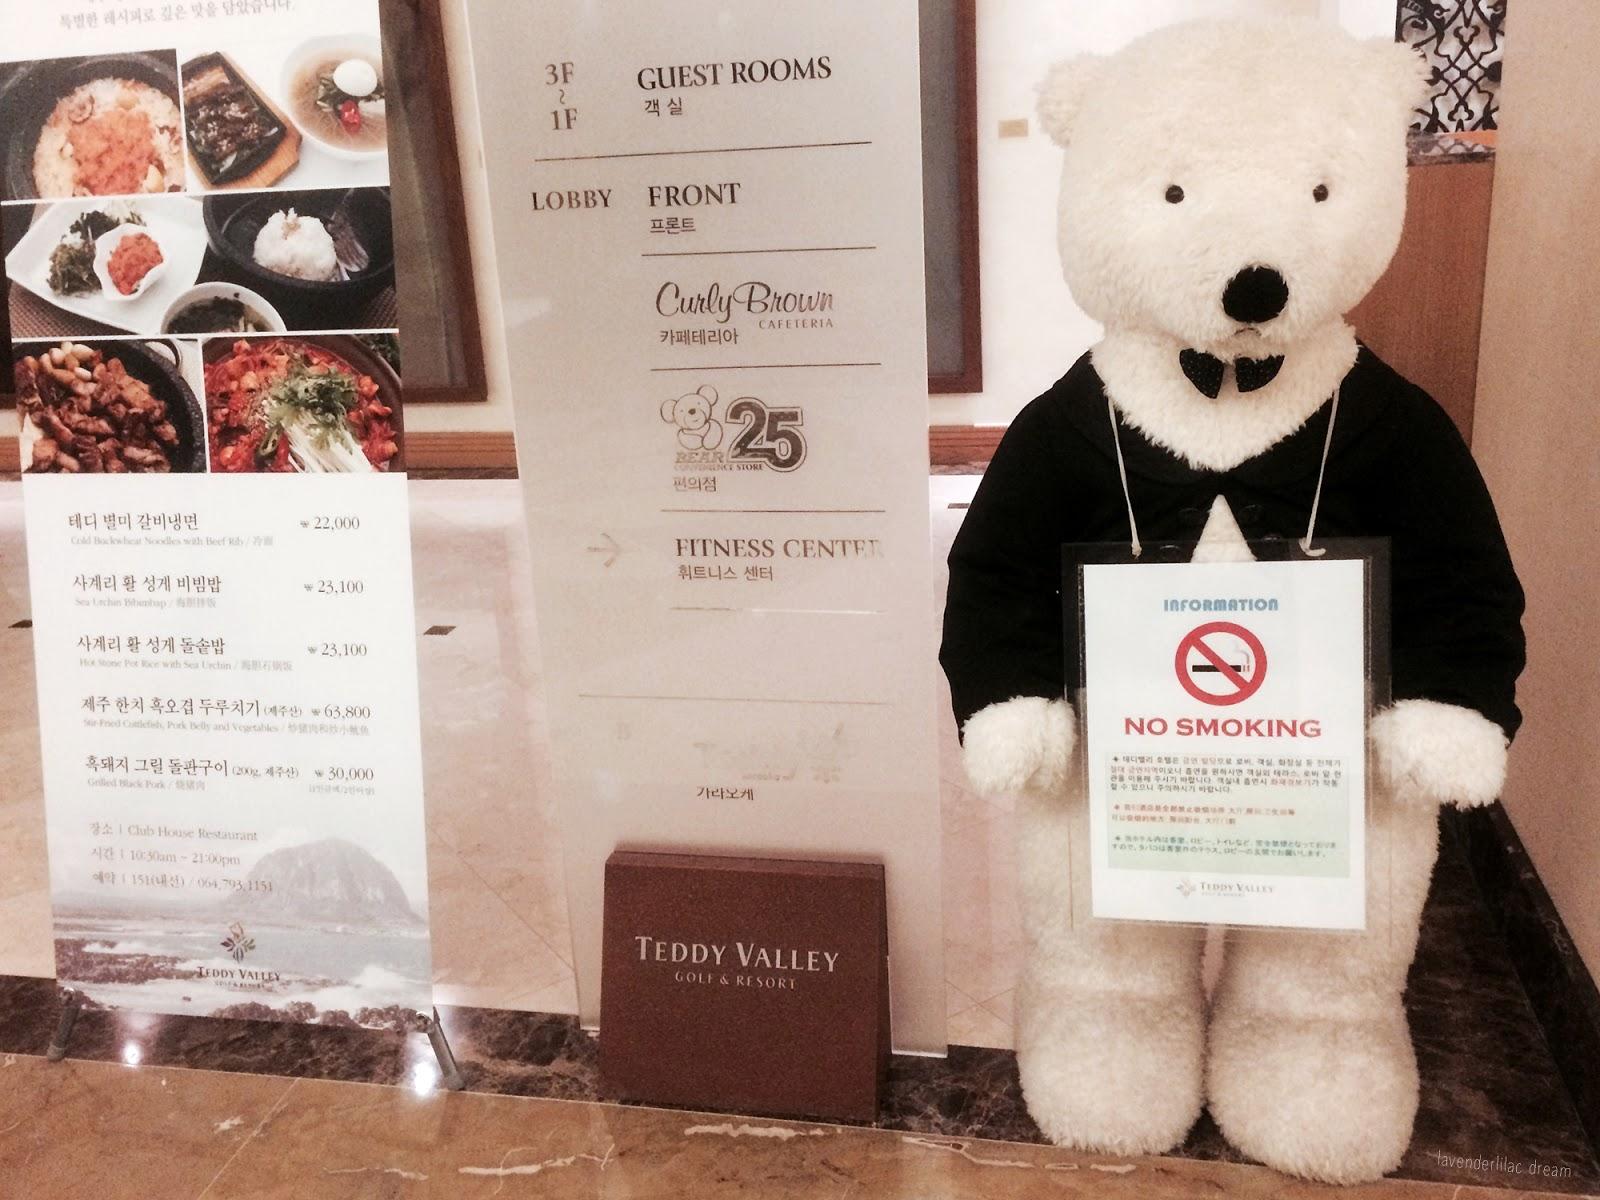 South Korea, Jeju Island, Yonsei University, YISS 2014, Teddy Valley Golf & Resort, Giant teddy bear